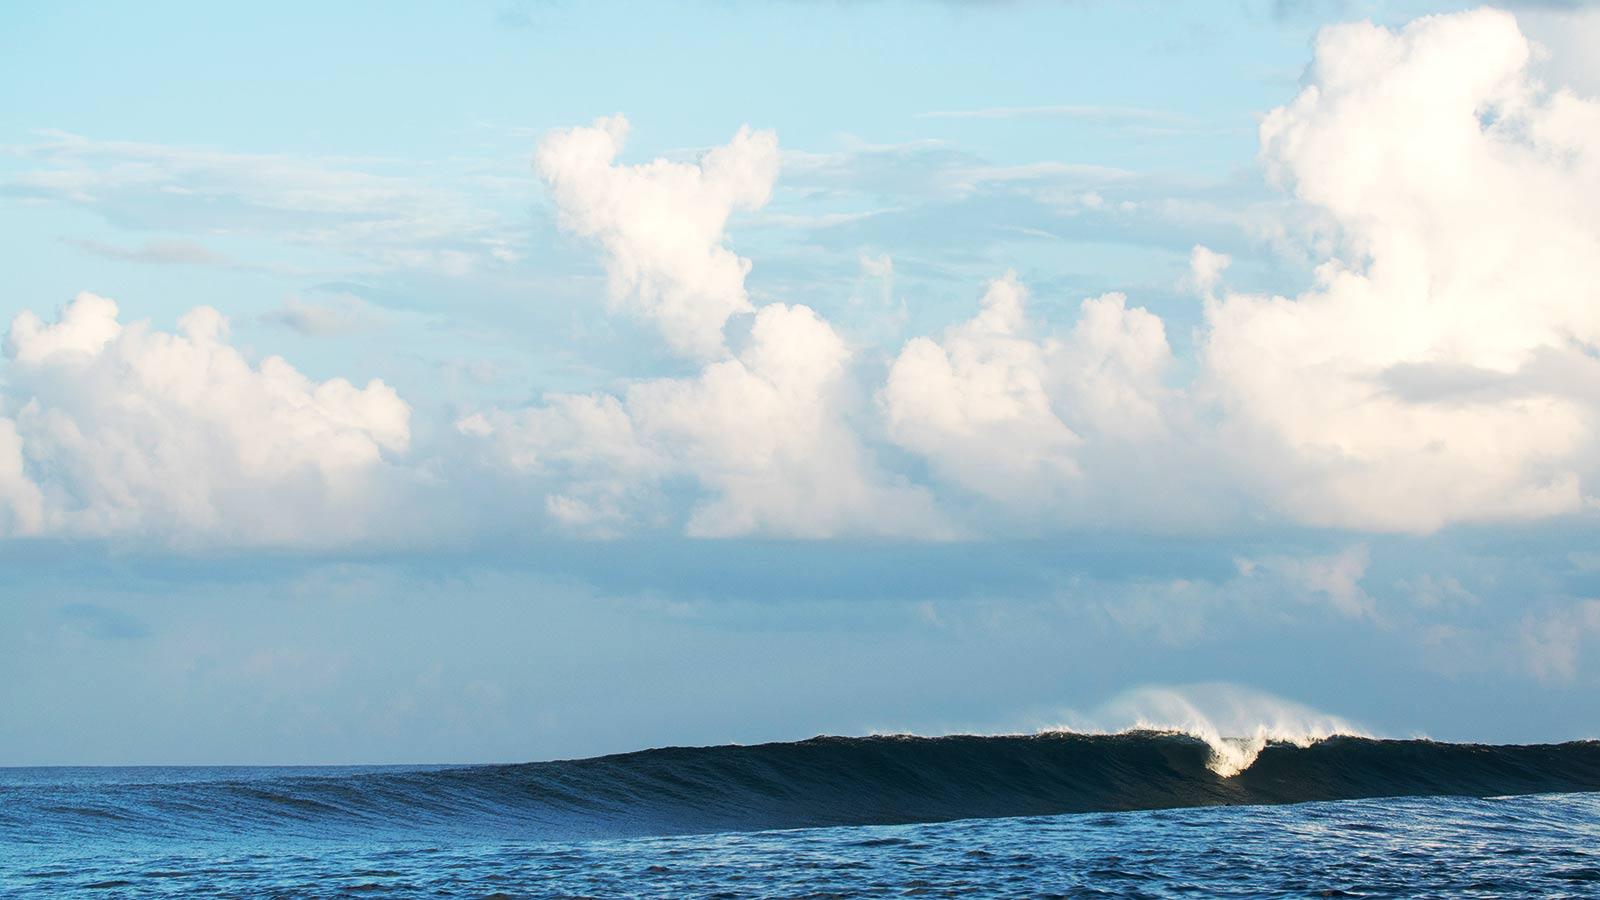 maldive-2017-surf-trip-surf-culture